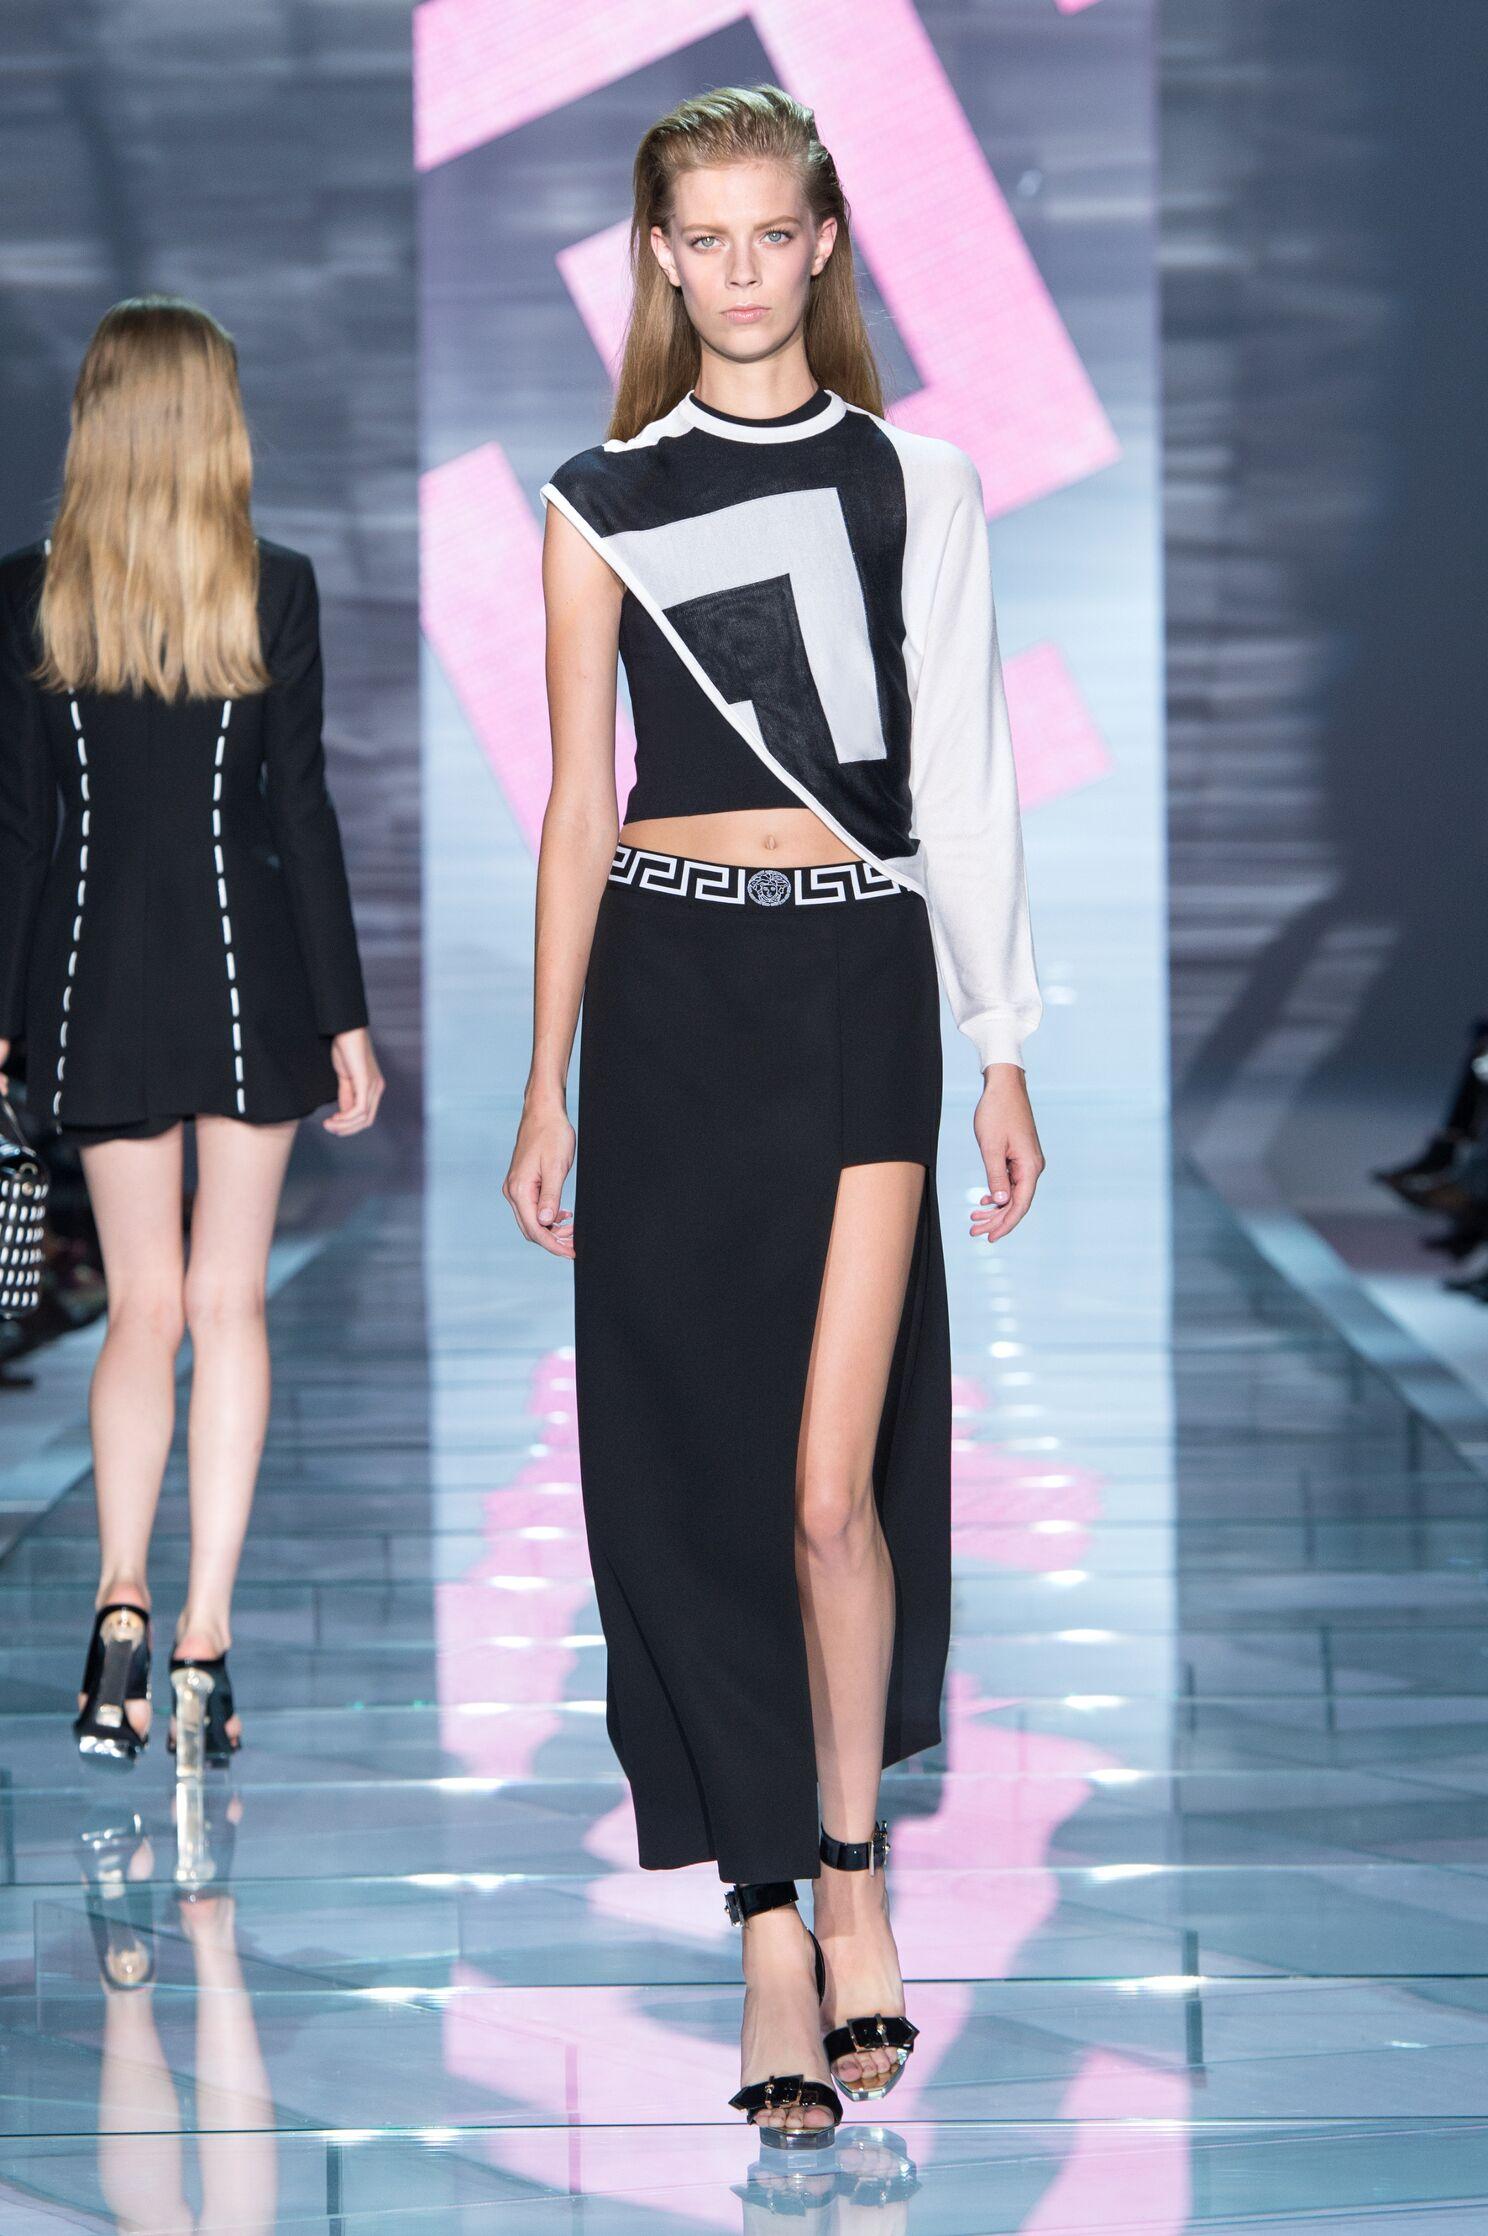 Spring Summer 2015 Fashion Model Versace